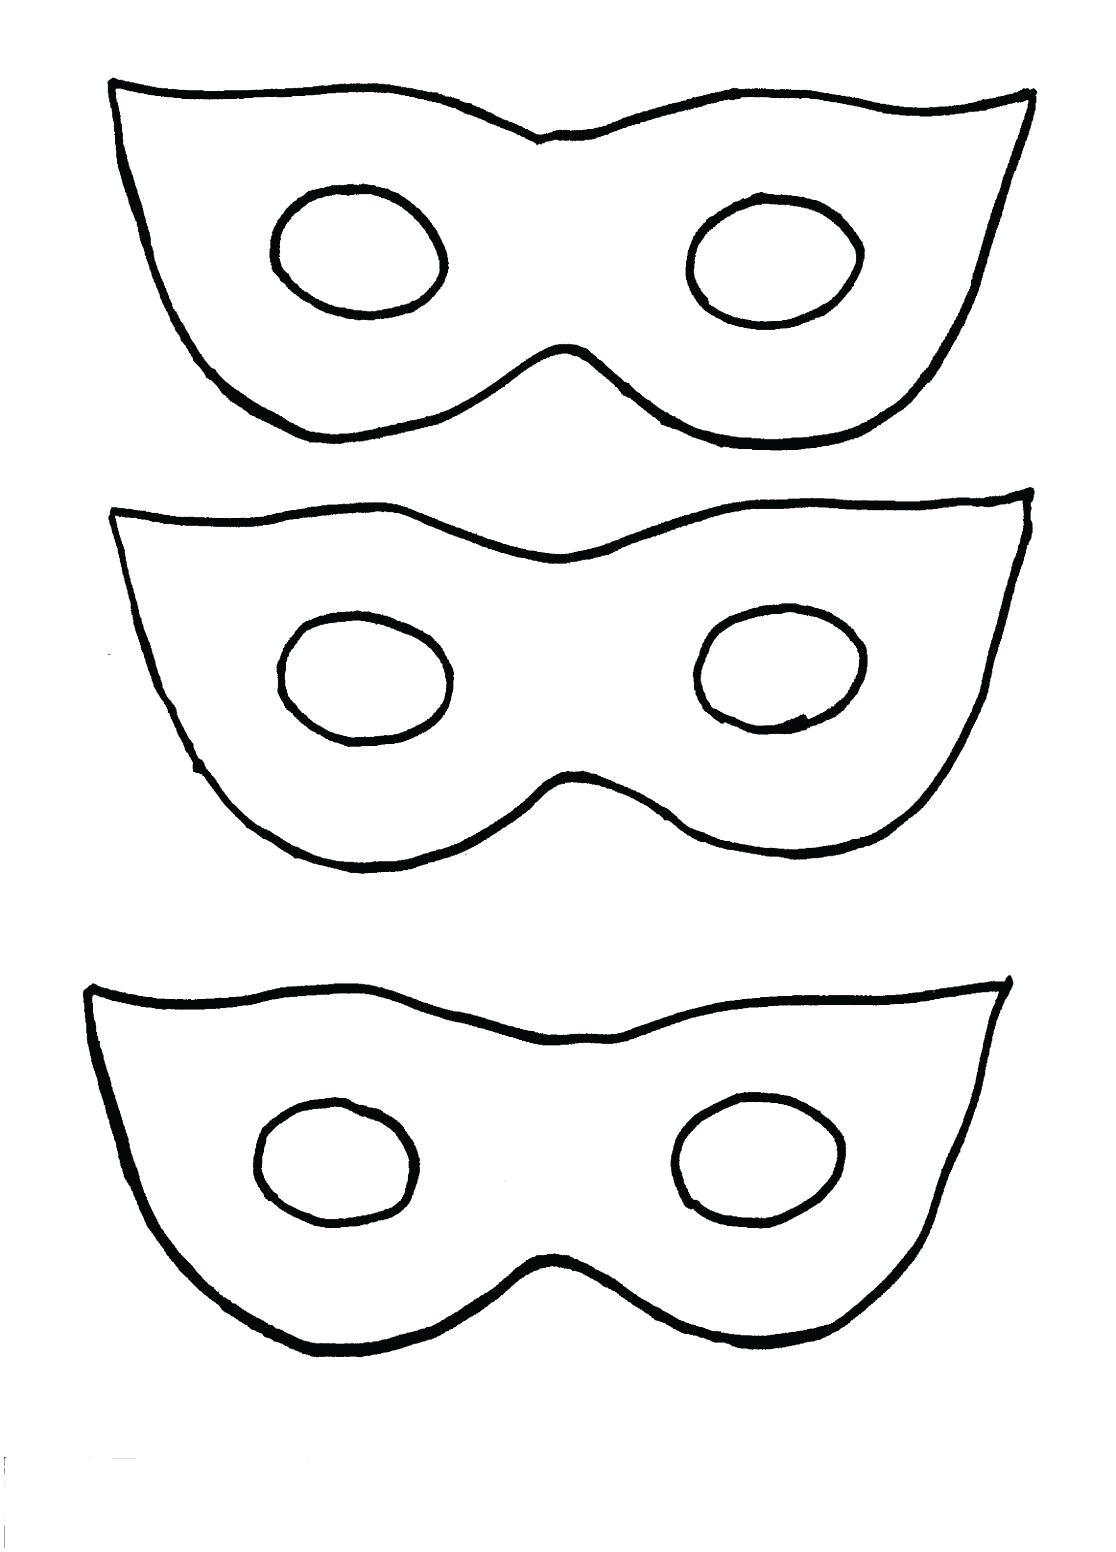 donkey face mask template